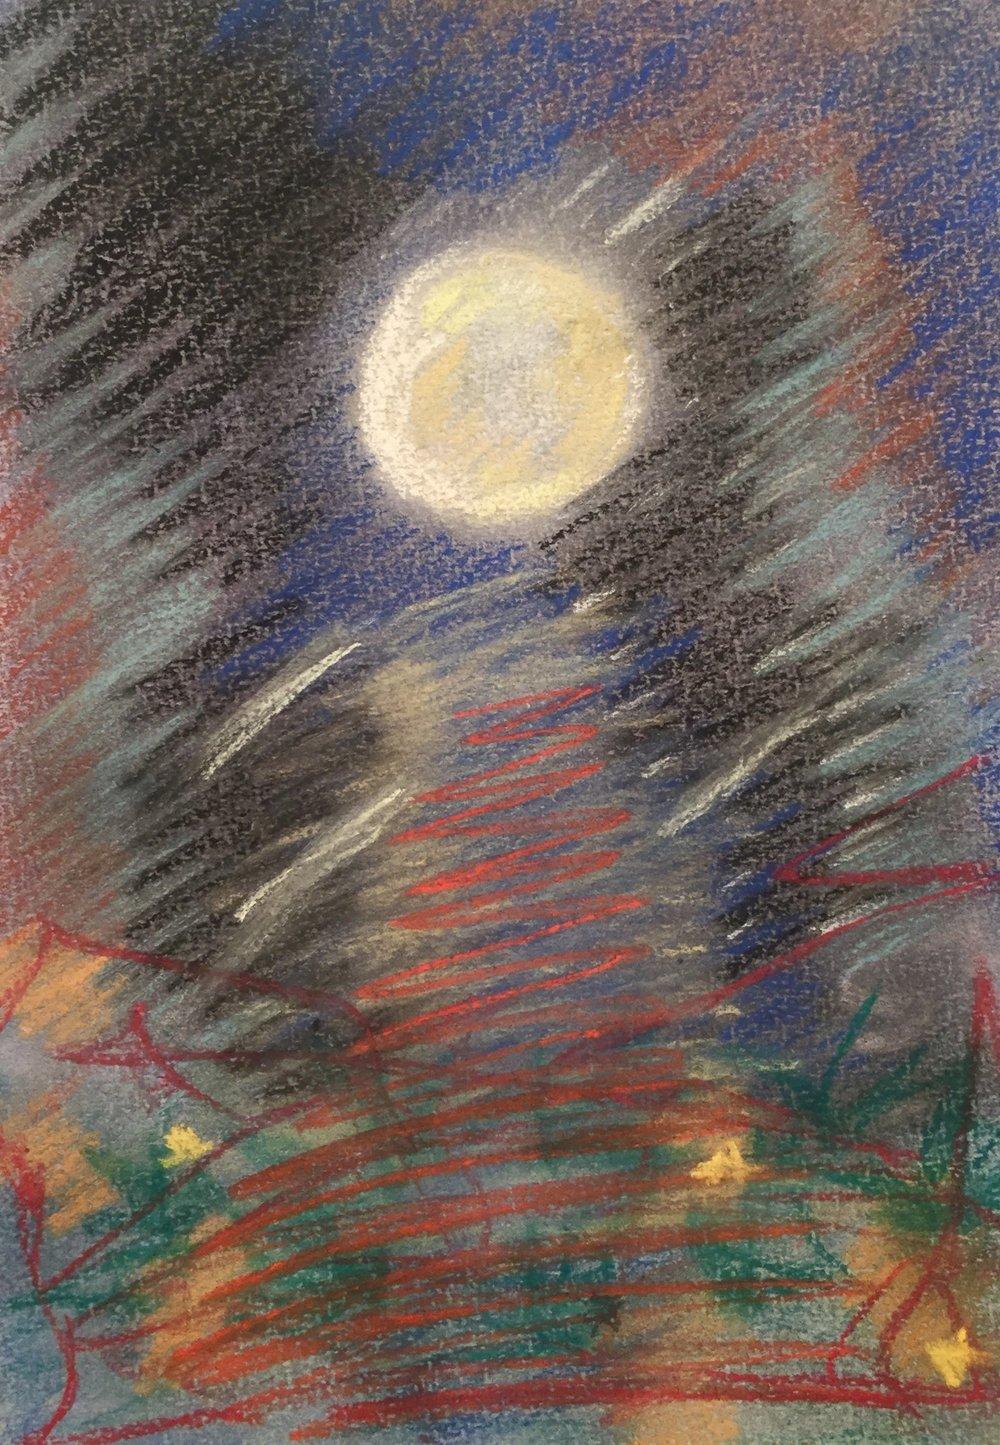 Full Moon Walk in the Catskills, 12 x 9 Pastel on Paper, 1996